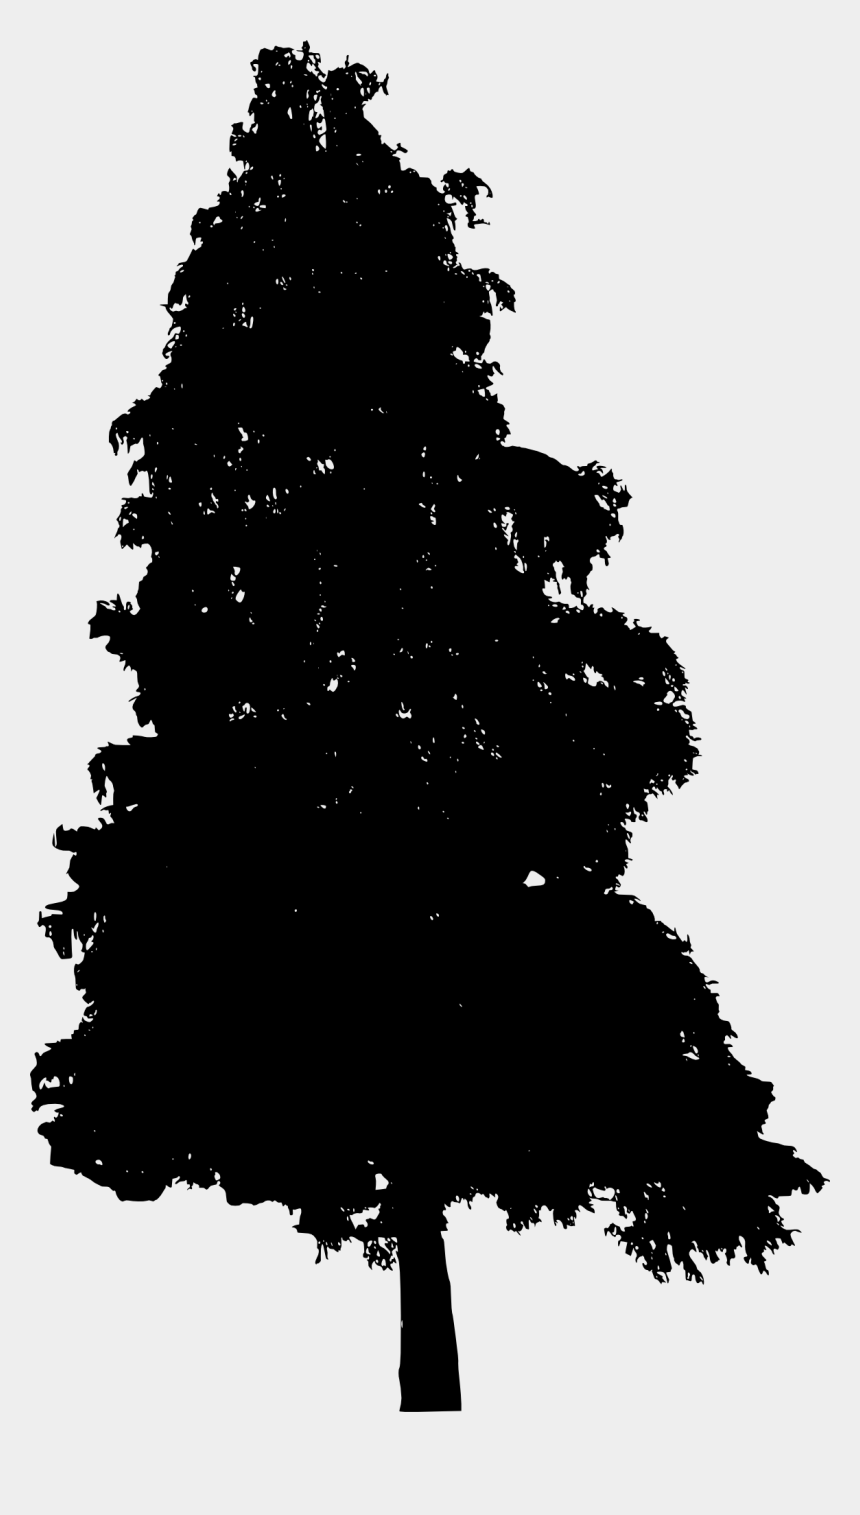 pine tree clipart transparent background, Cartoons - Pine